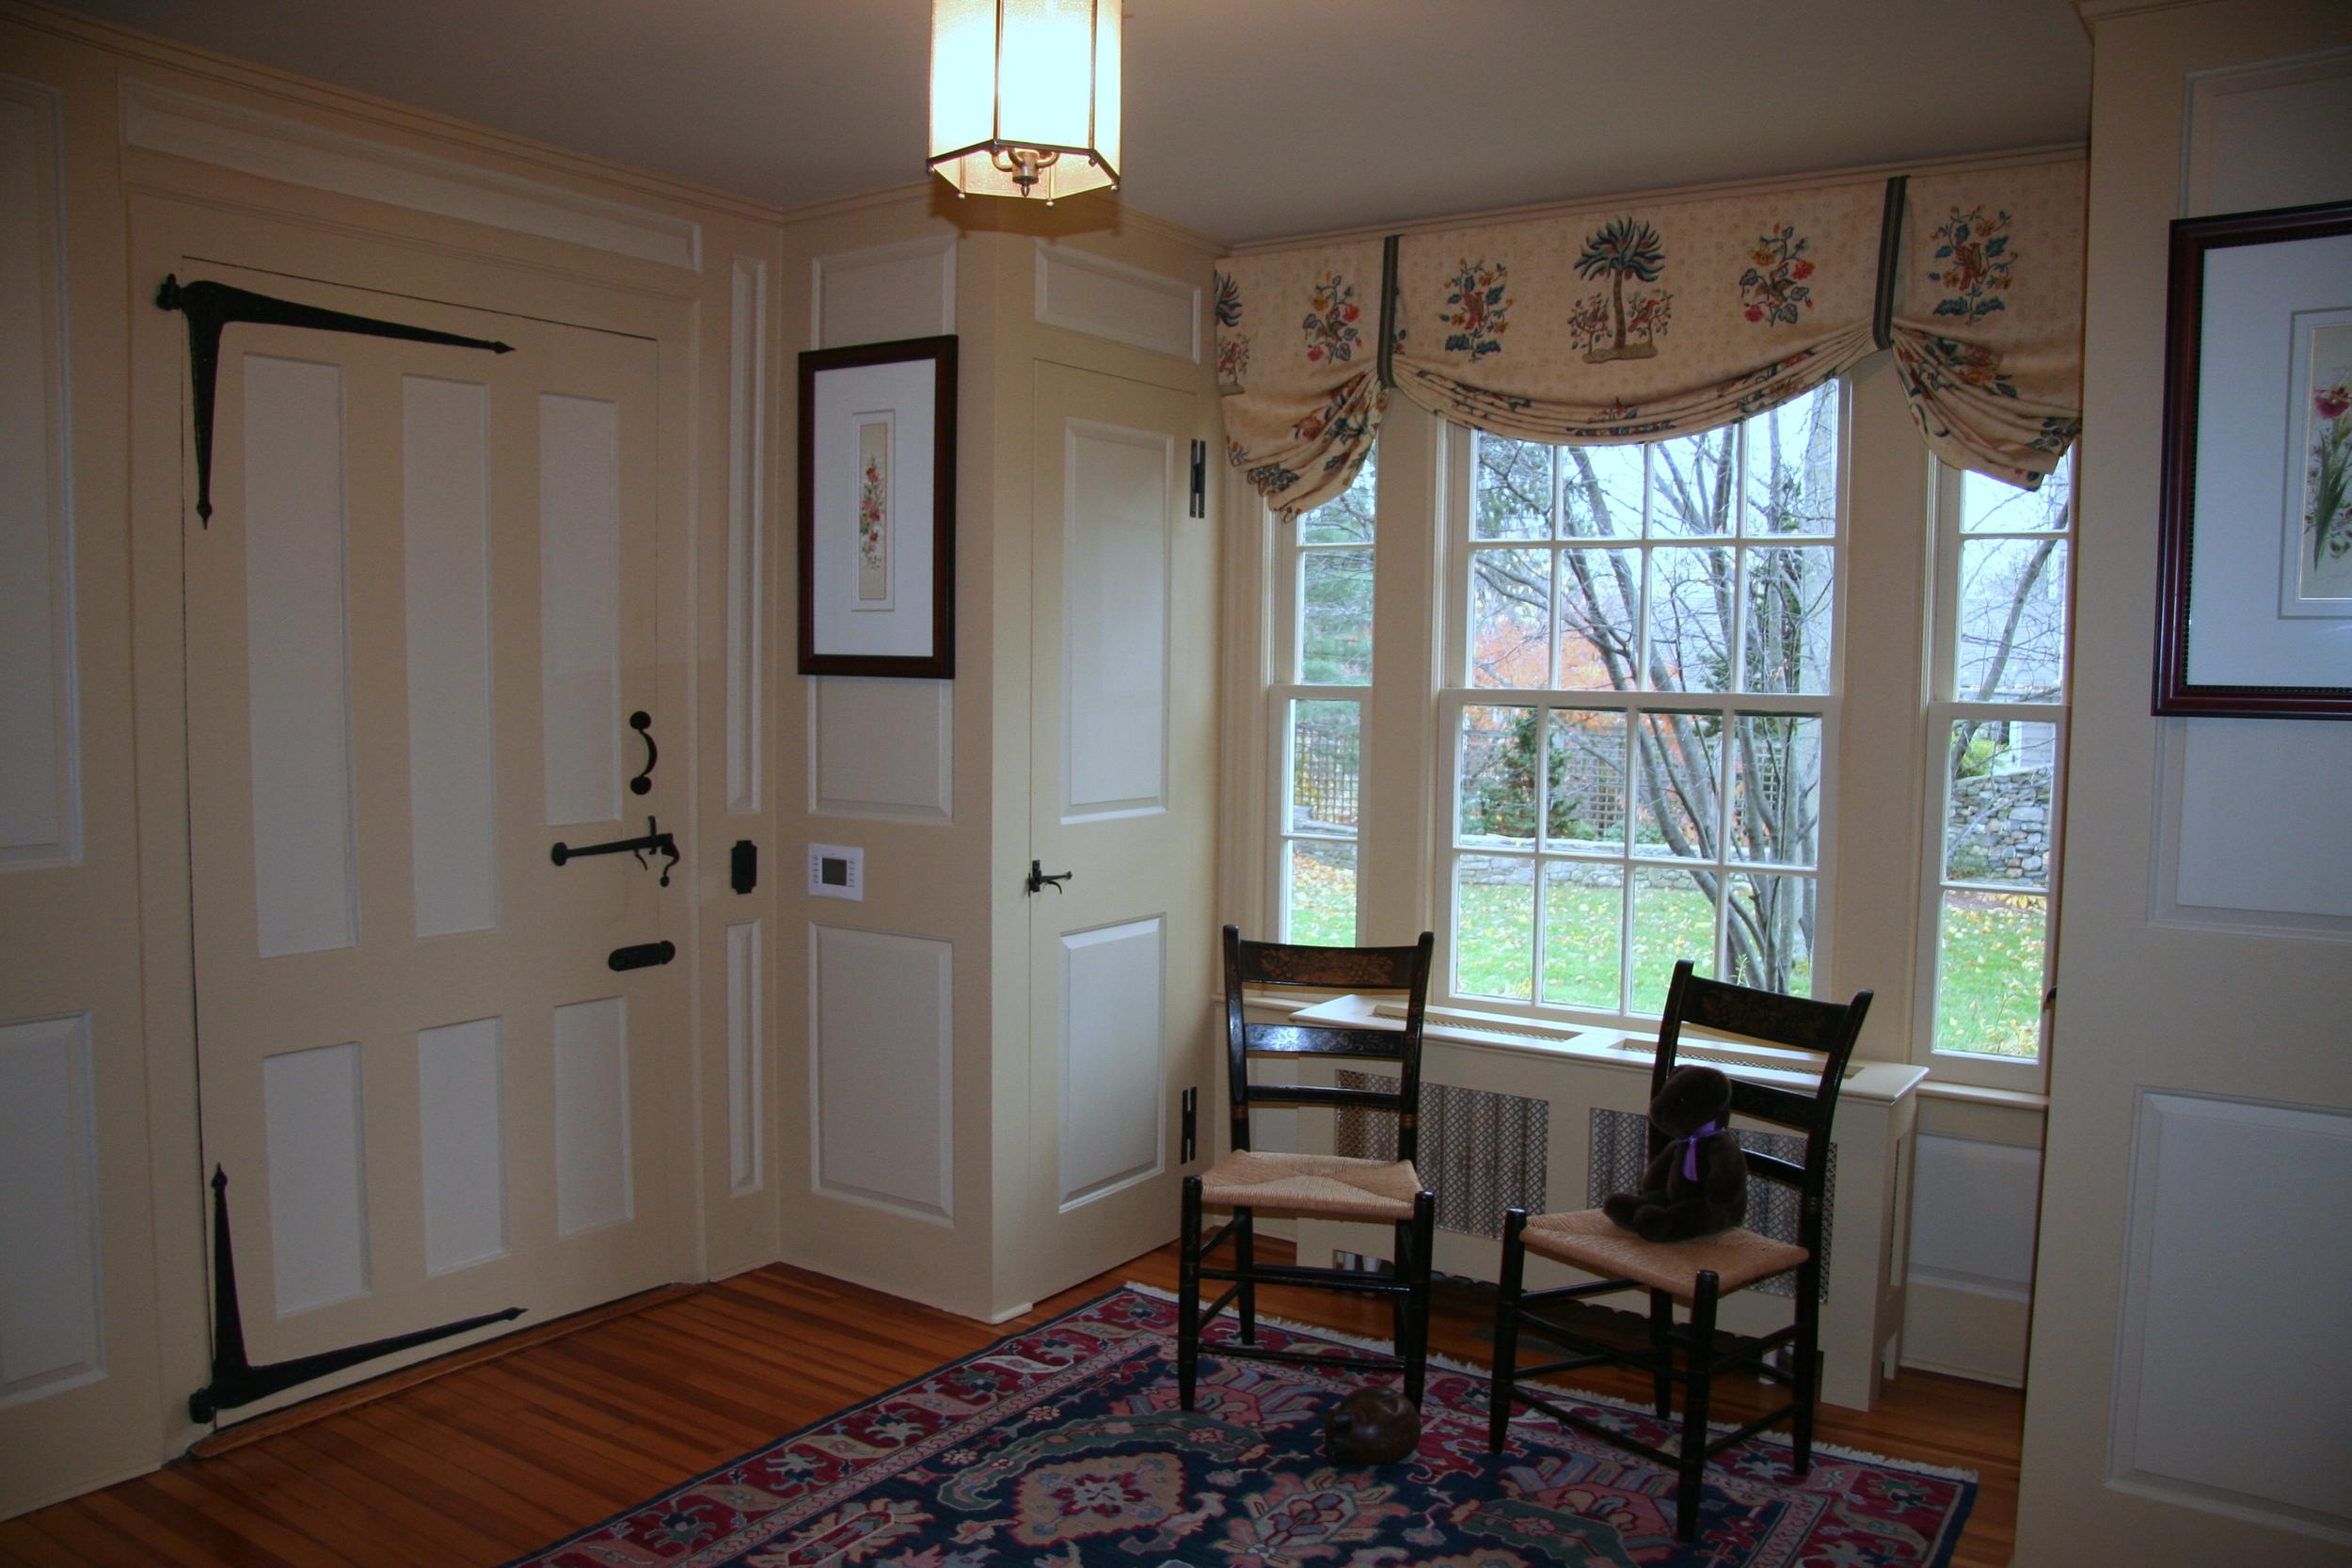 Fairfield-County-Dale-Minske-Interior-Design-Antique-33.JPG